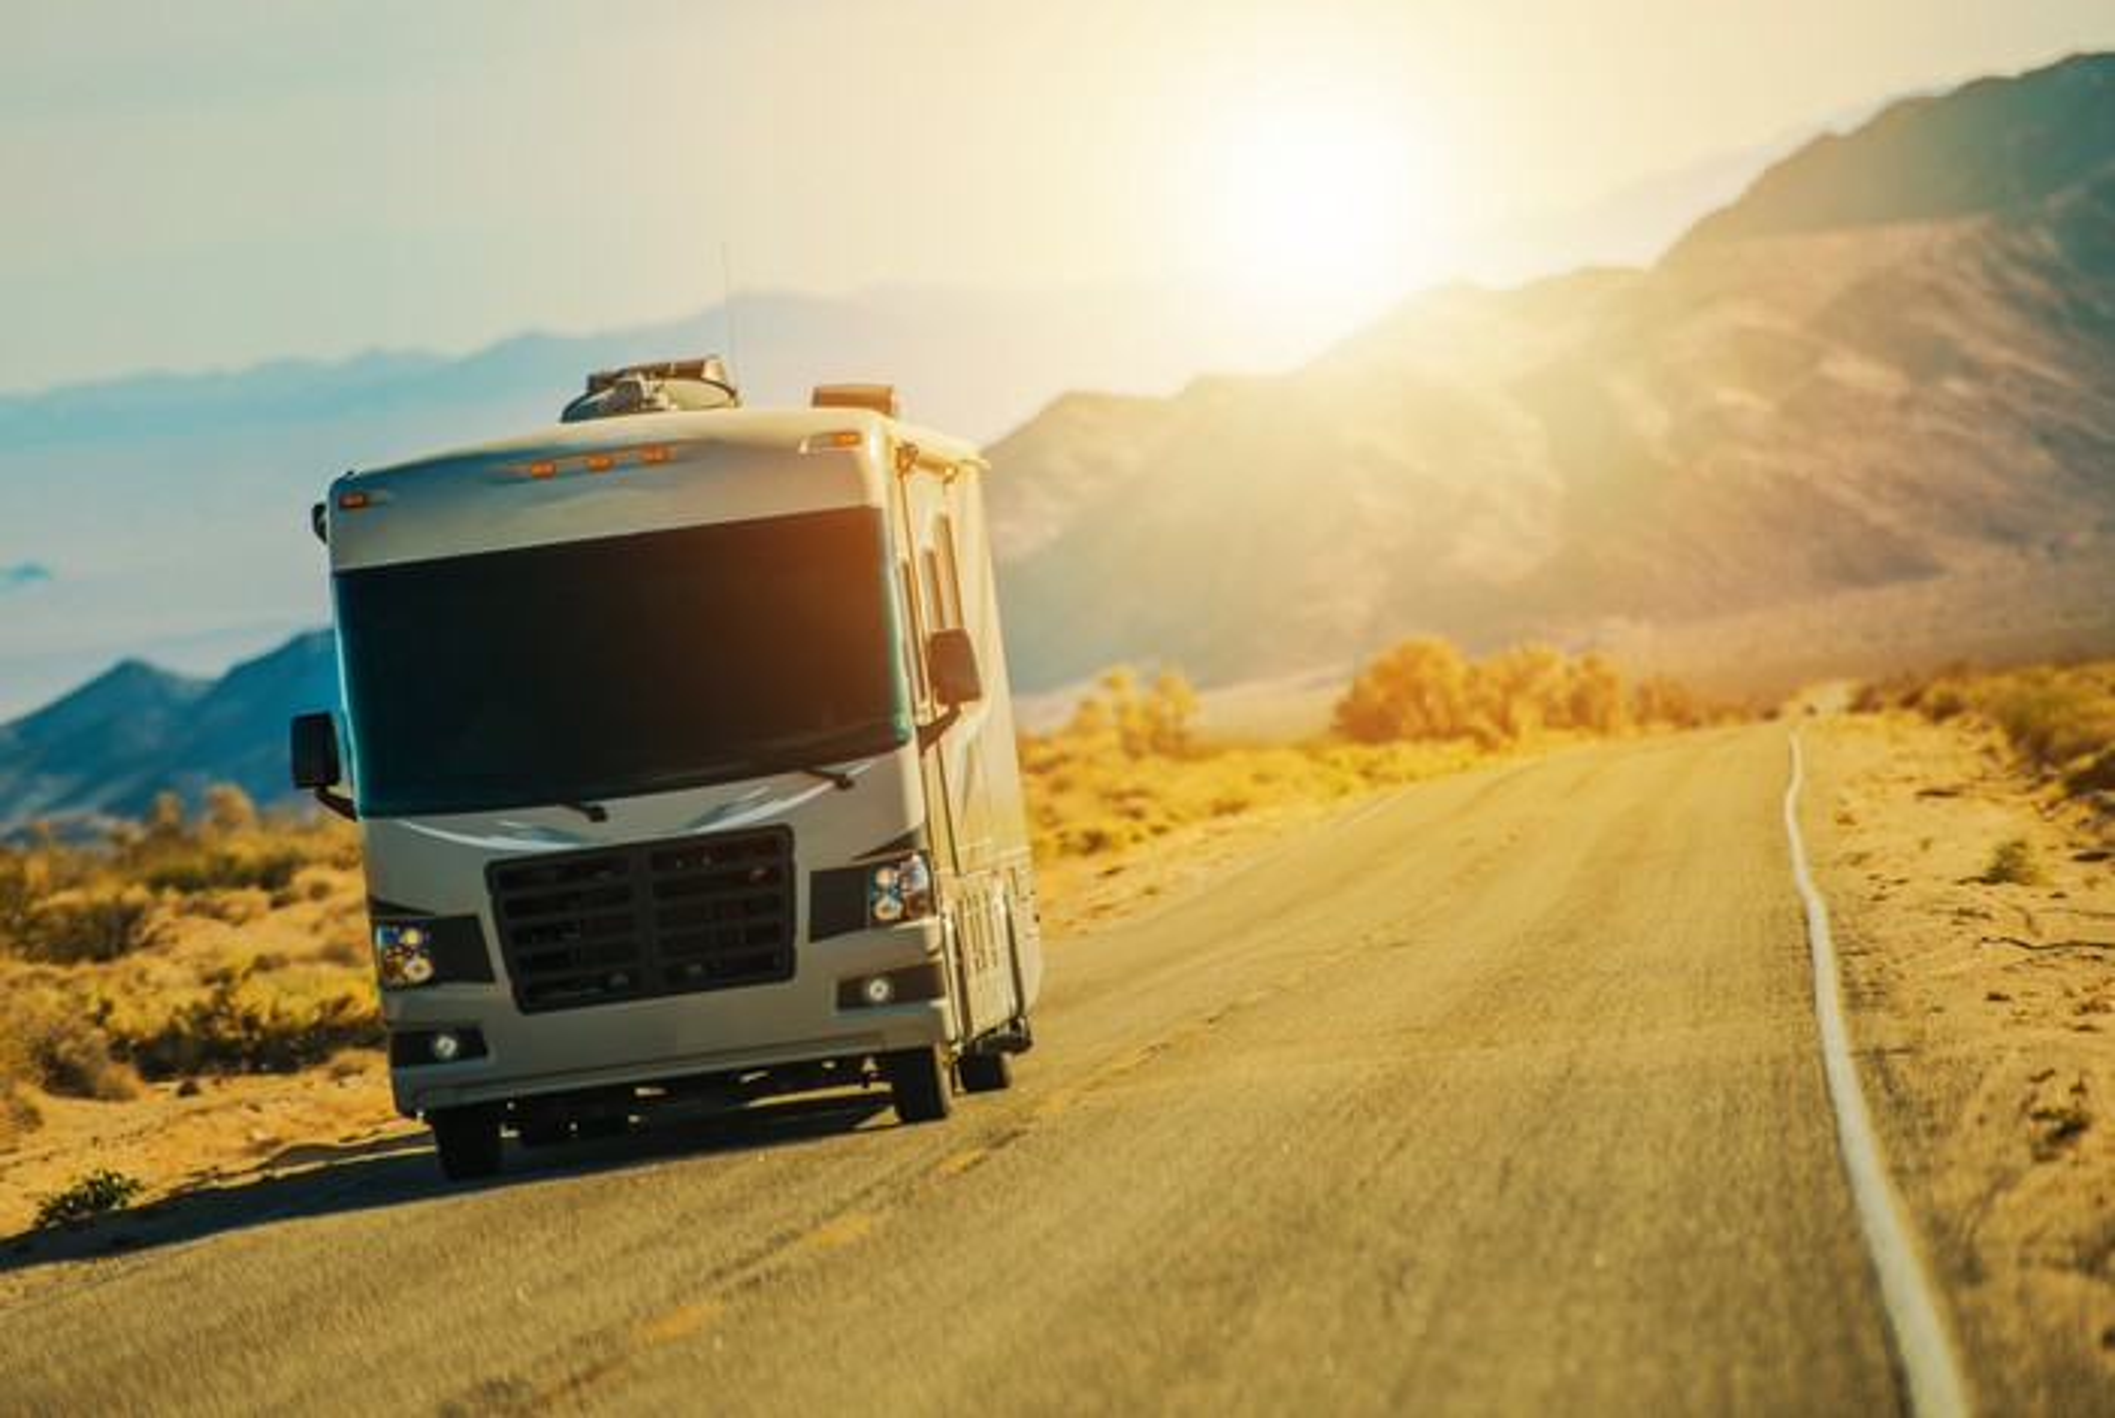 An RV drives along a rural road as the sun sets behind it.